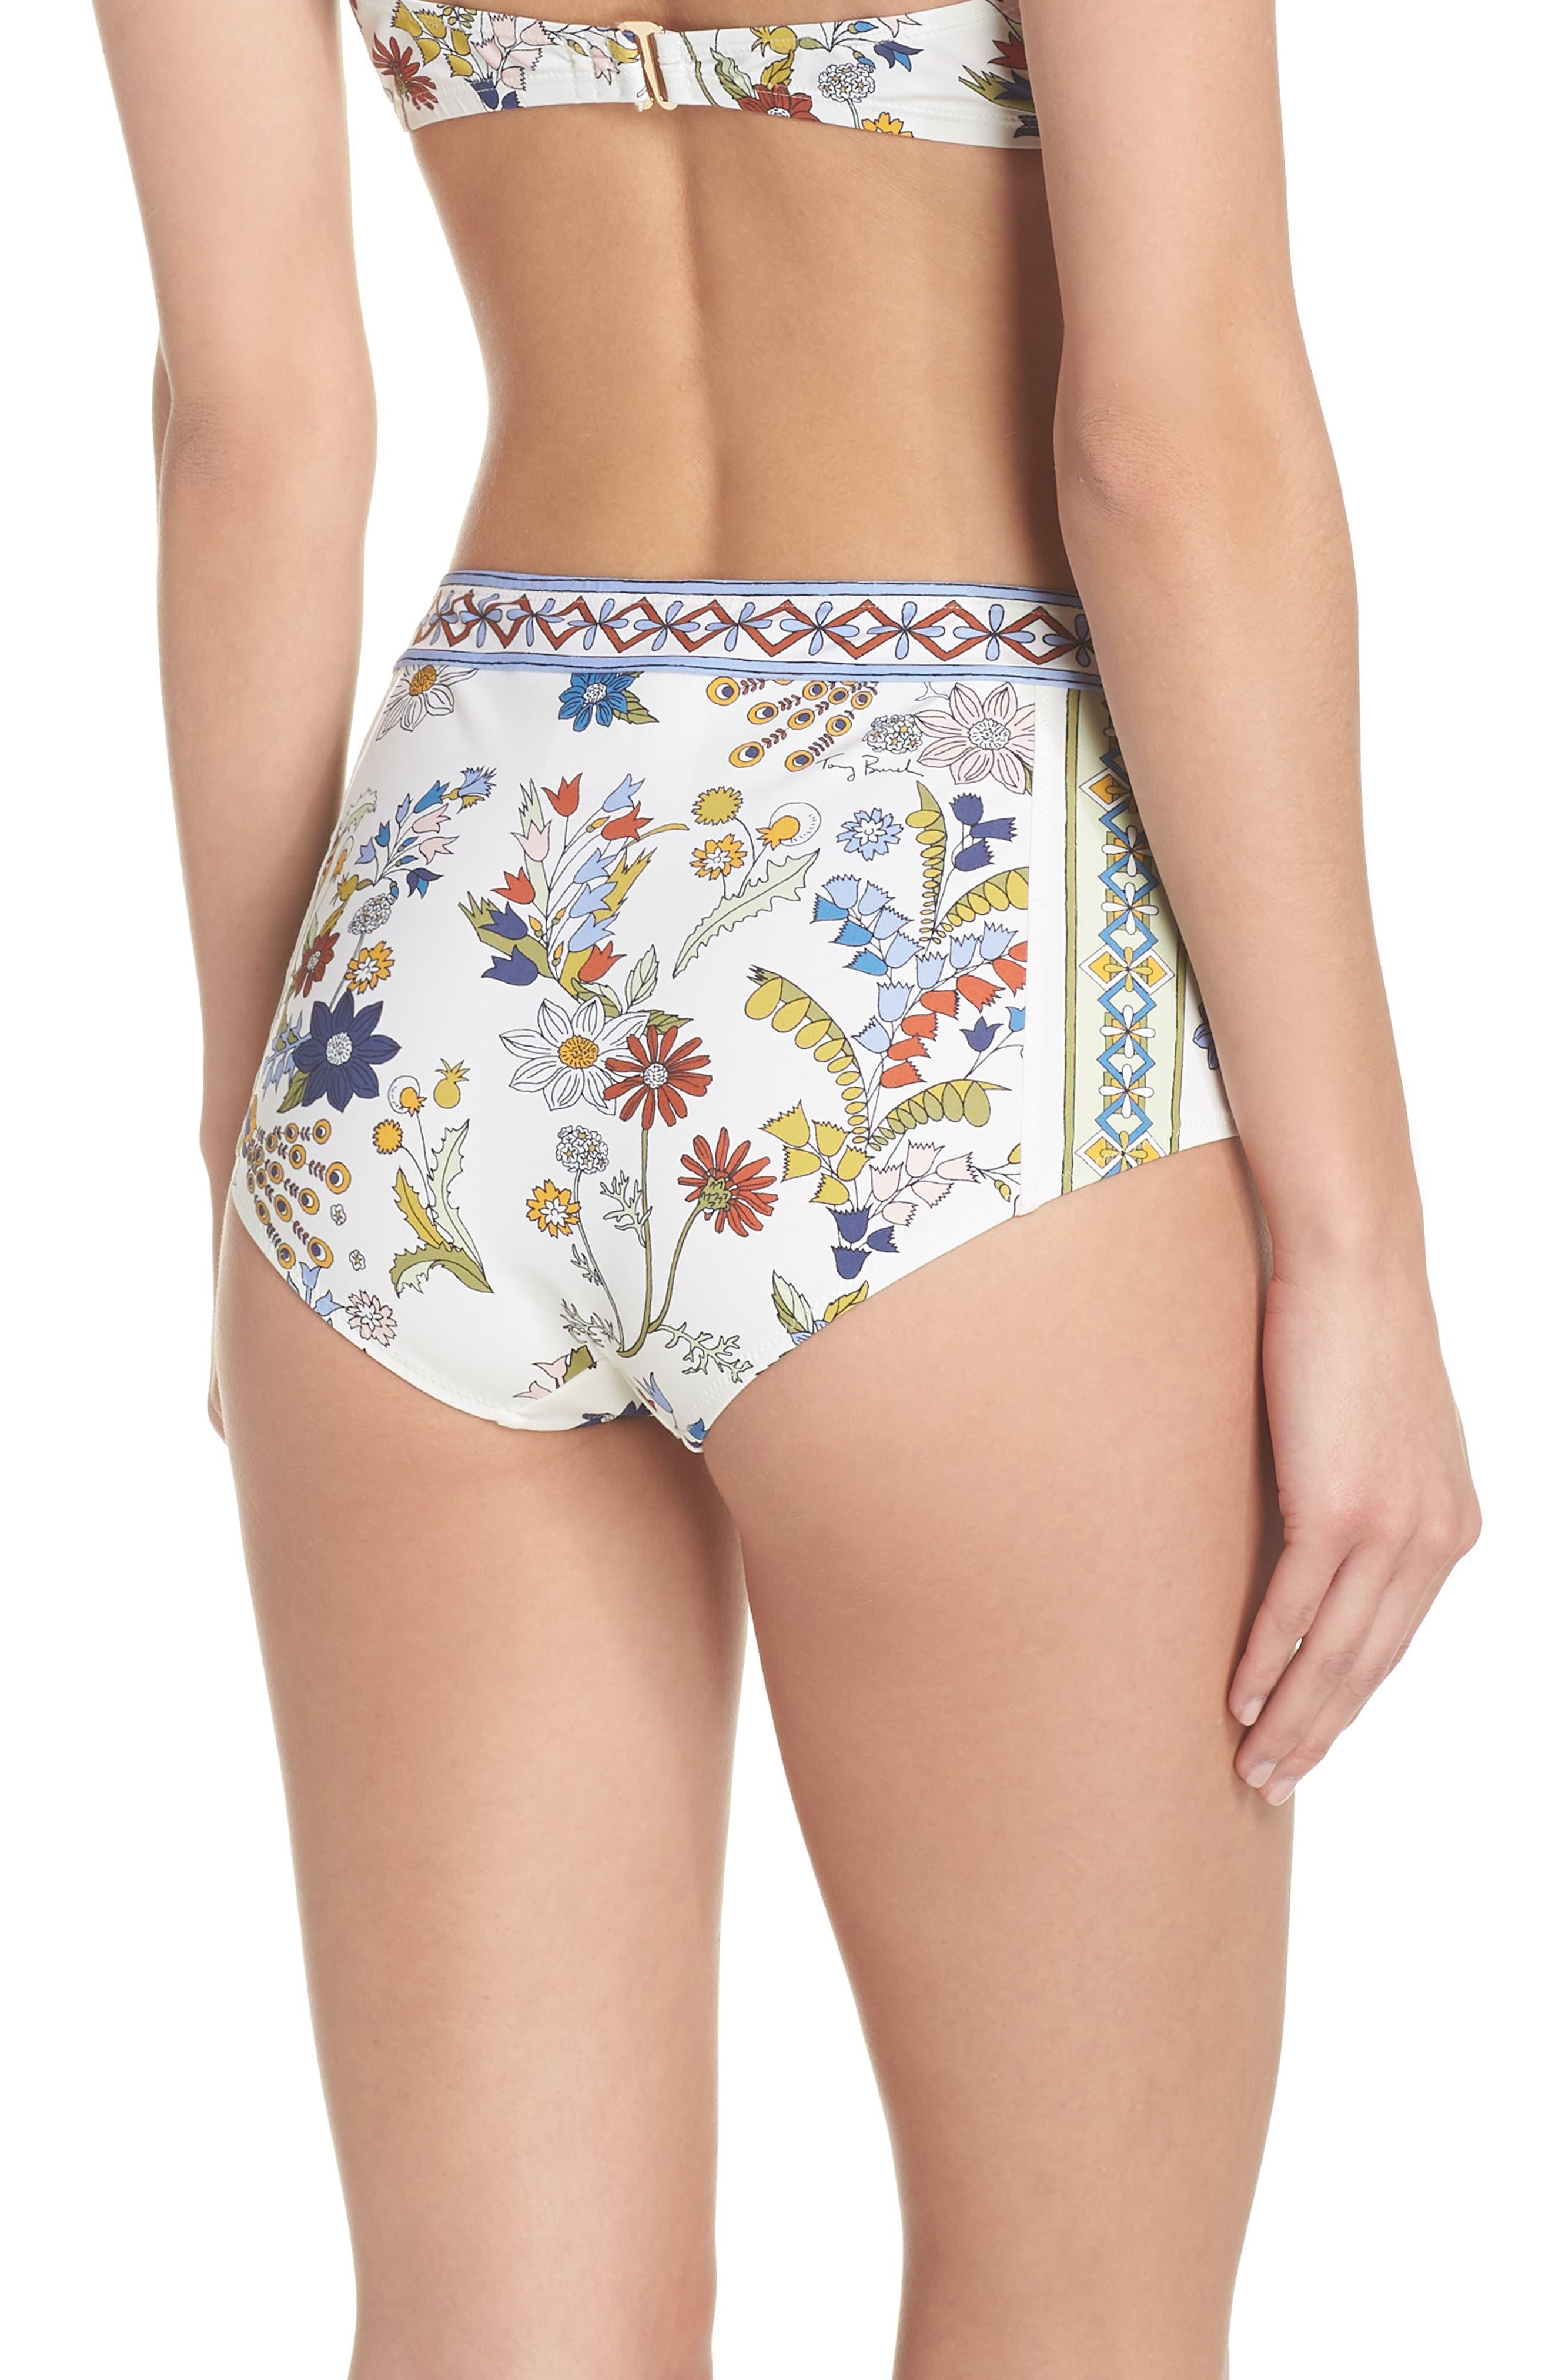 Meadow Folly High Waist Bikini Bottoms,                             Alternate thumbnail 2, color,                             900